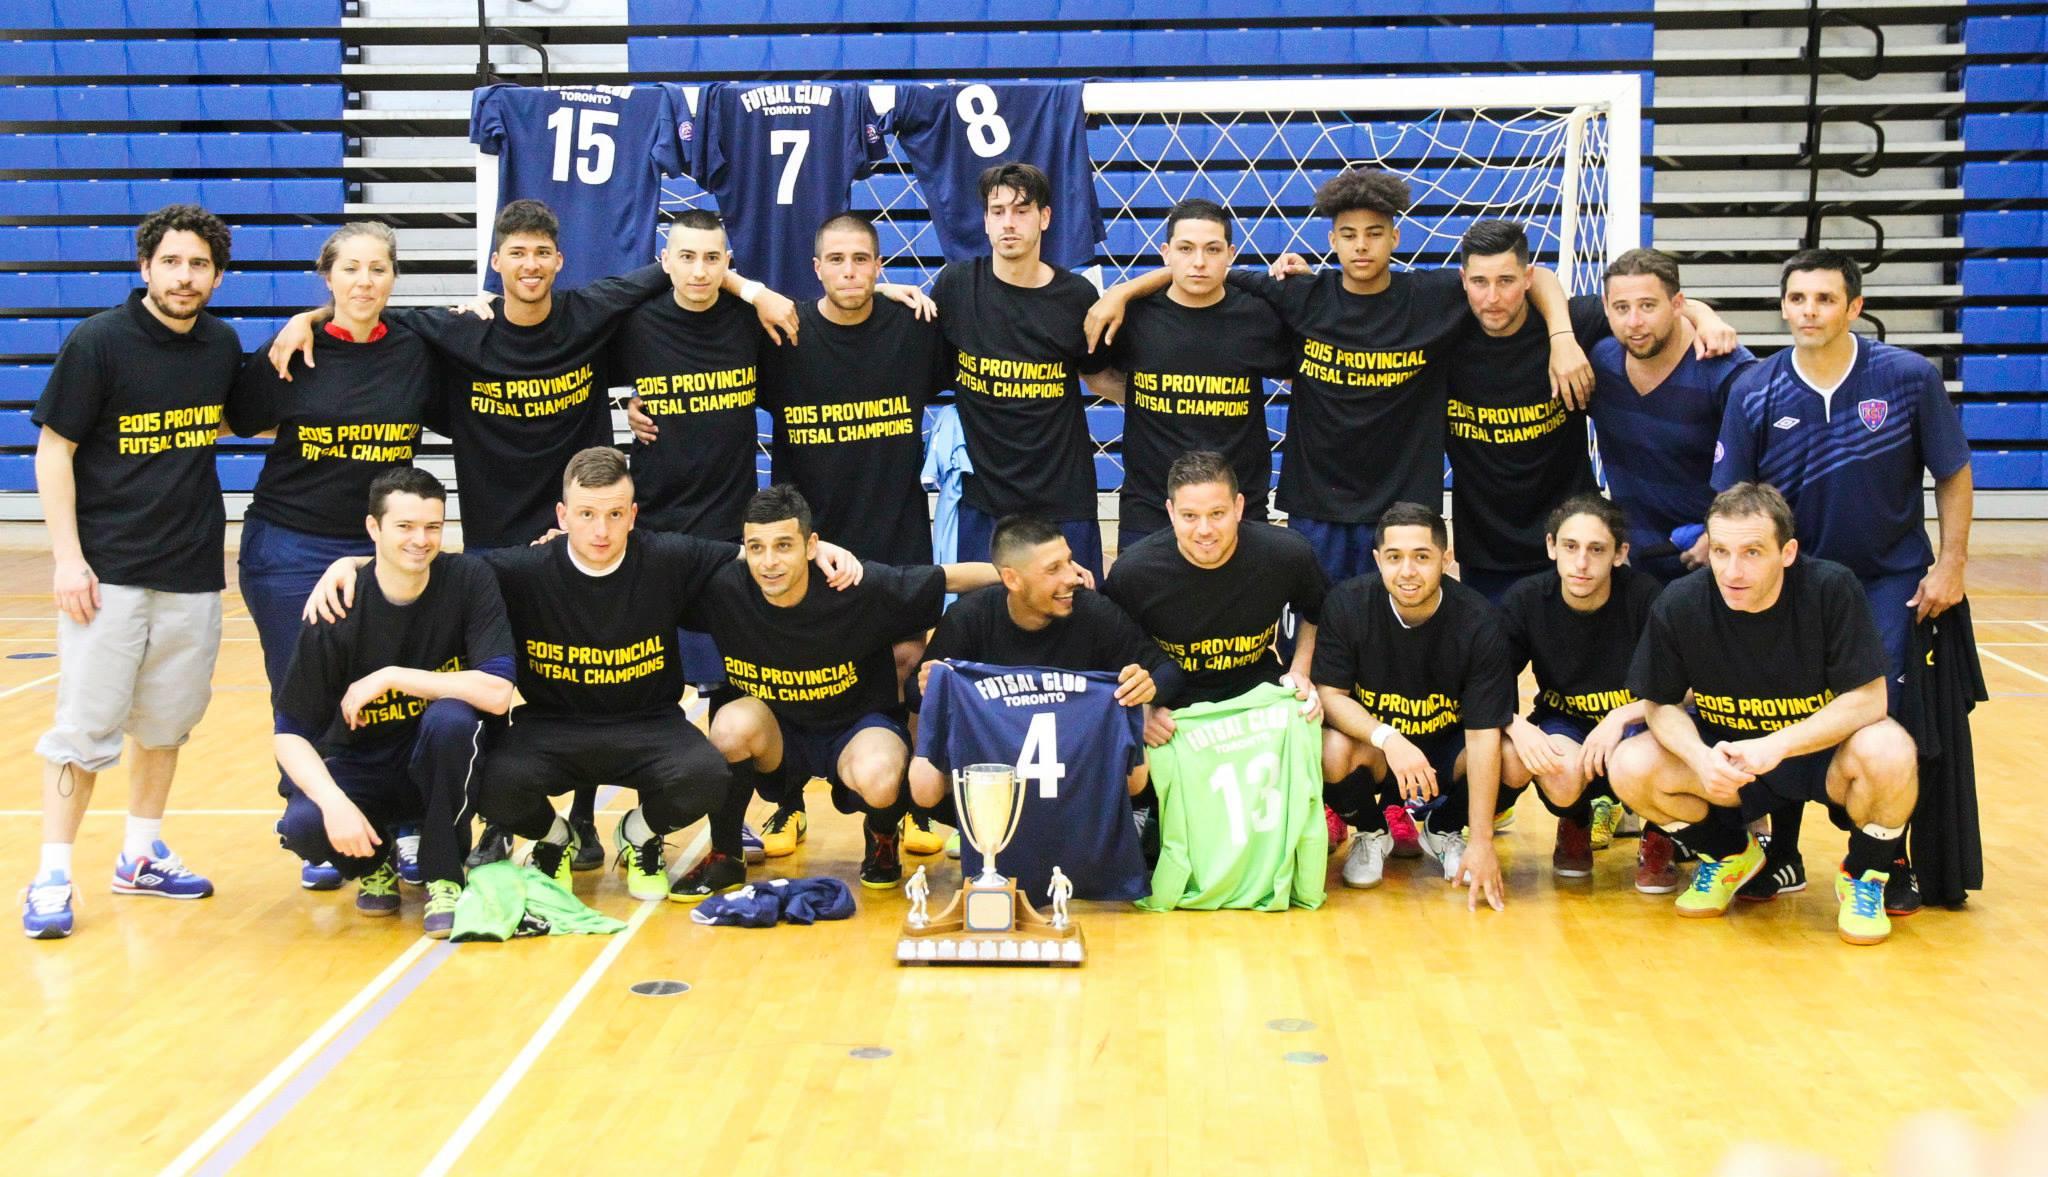 ff99912745 Futsal Club Toronto Crowned At Ontario Futsal League Champions Cup